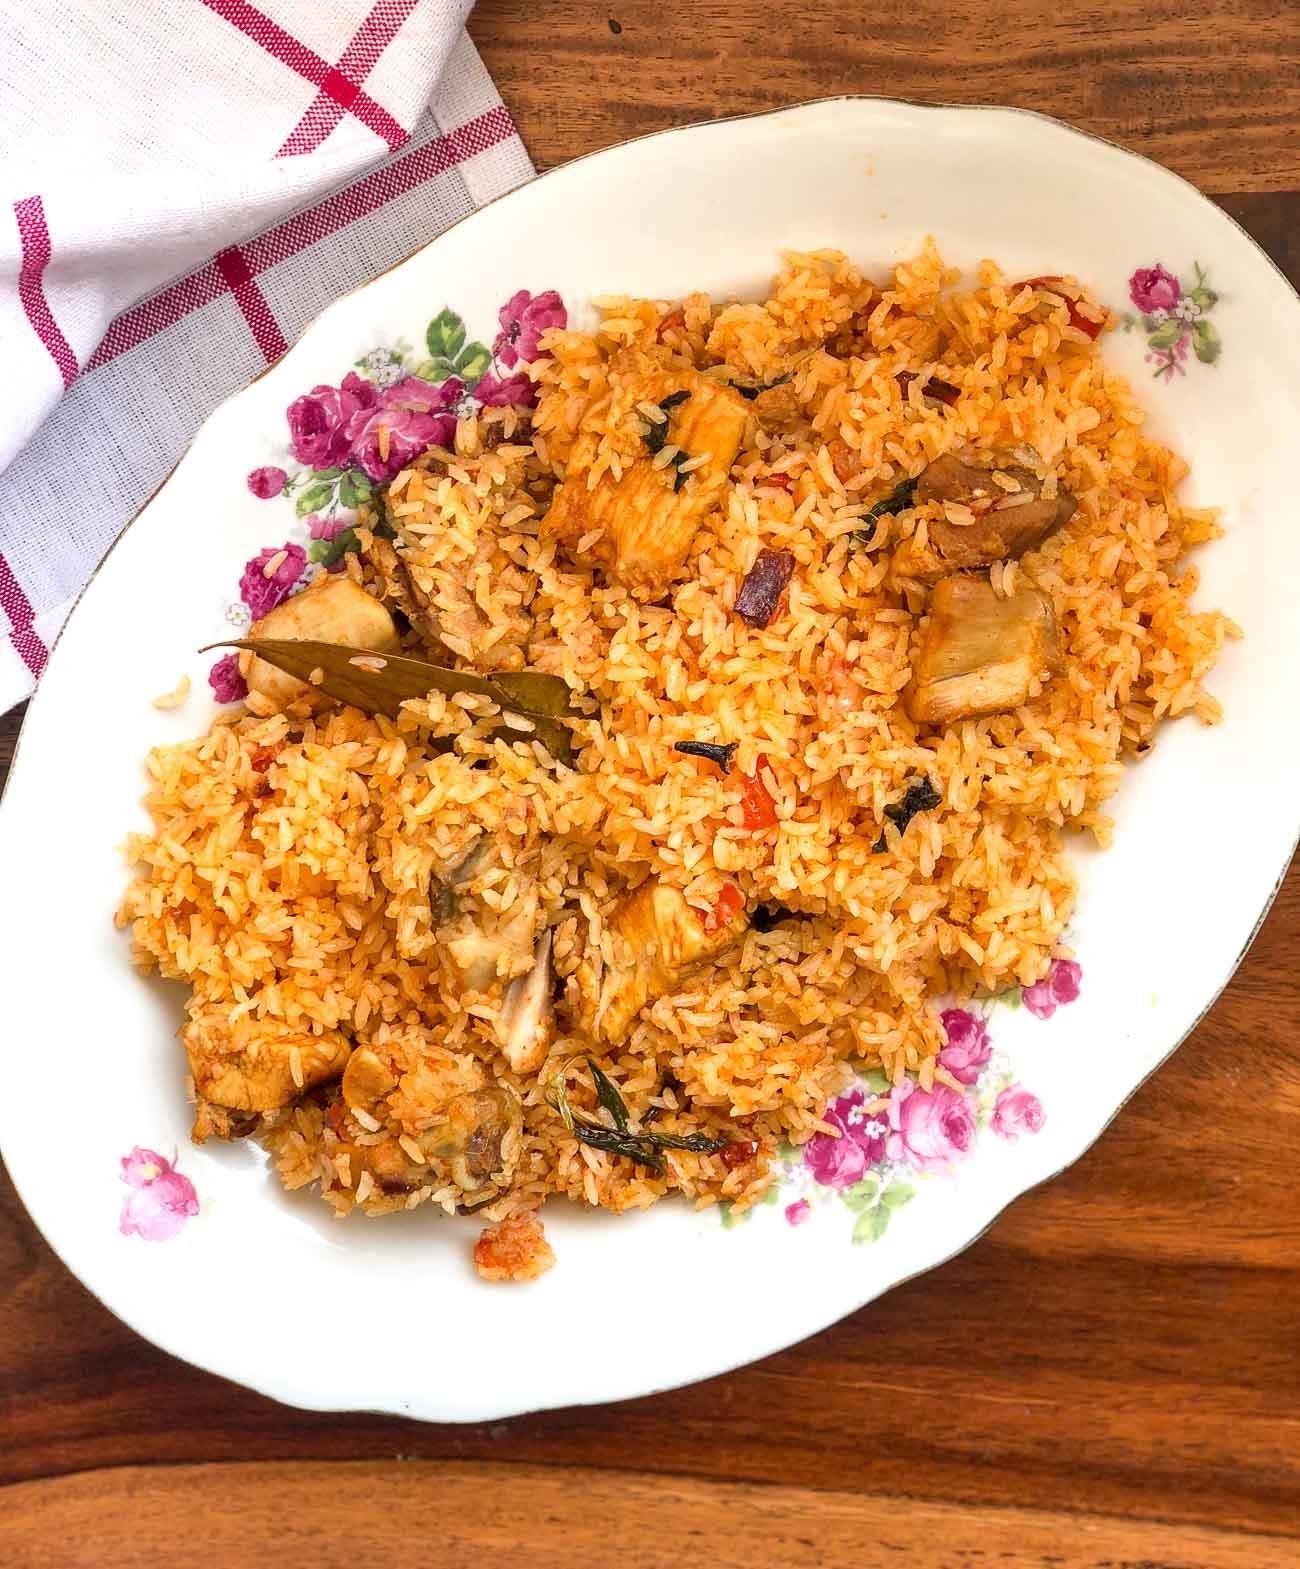 Ambur star chicken biryani recipe by archanas kitchen this biryani is a popular mildly spiced biryani from ambur in tamil nadu with succulent pieces of chicken cooked to perfection forumfinder Gallery